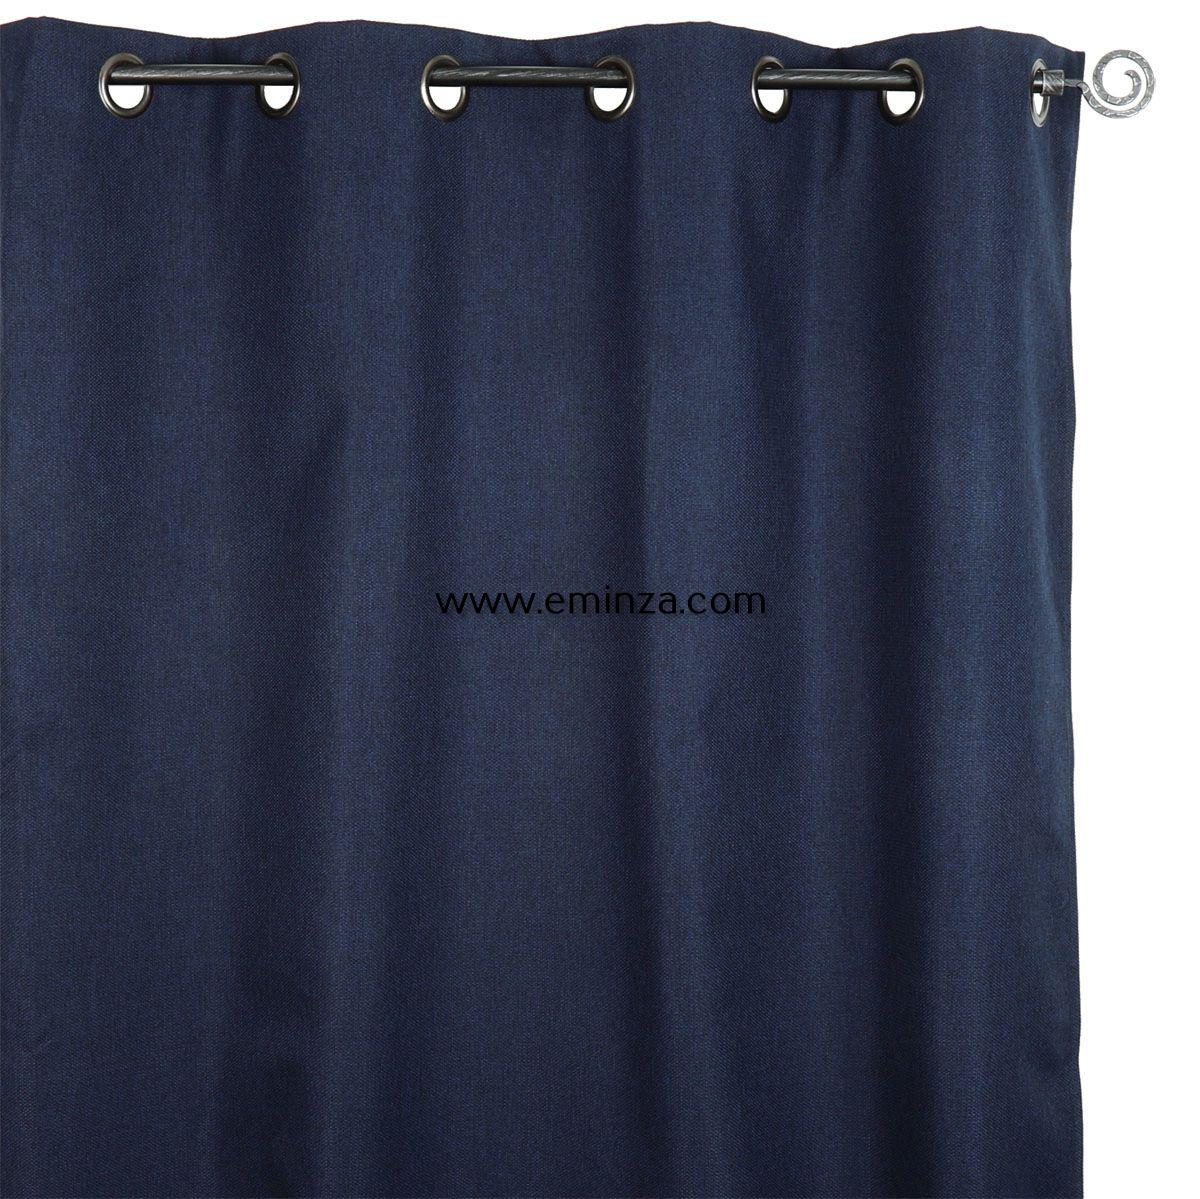 rideau occultant 140 x h240 cm calypso bleu roi rideau occultant eminza. Black Bedroom Furniture Sets. Home Design Ideas